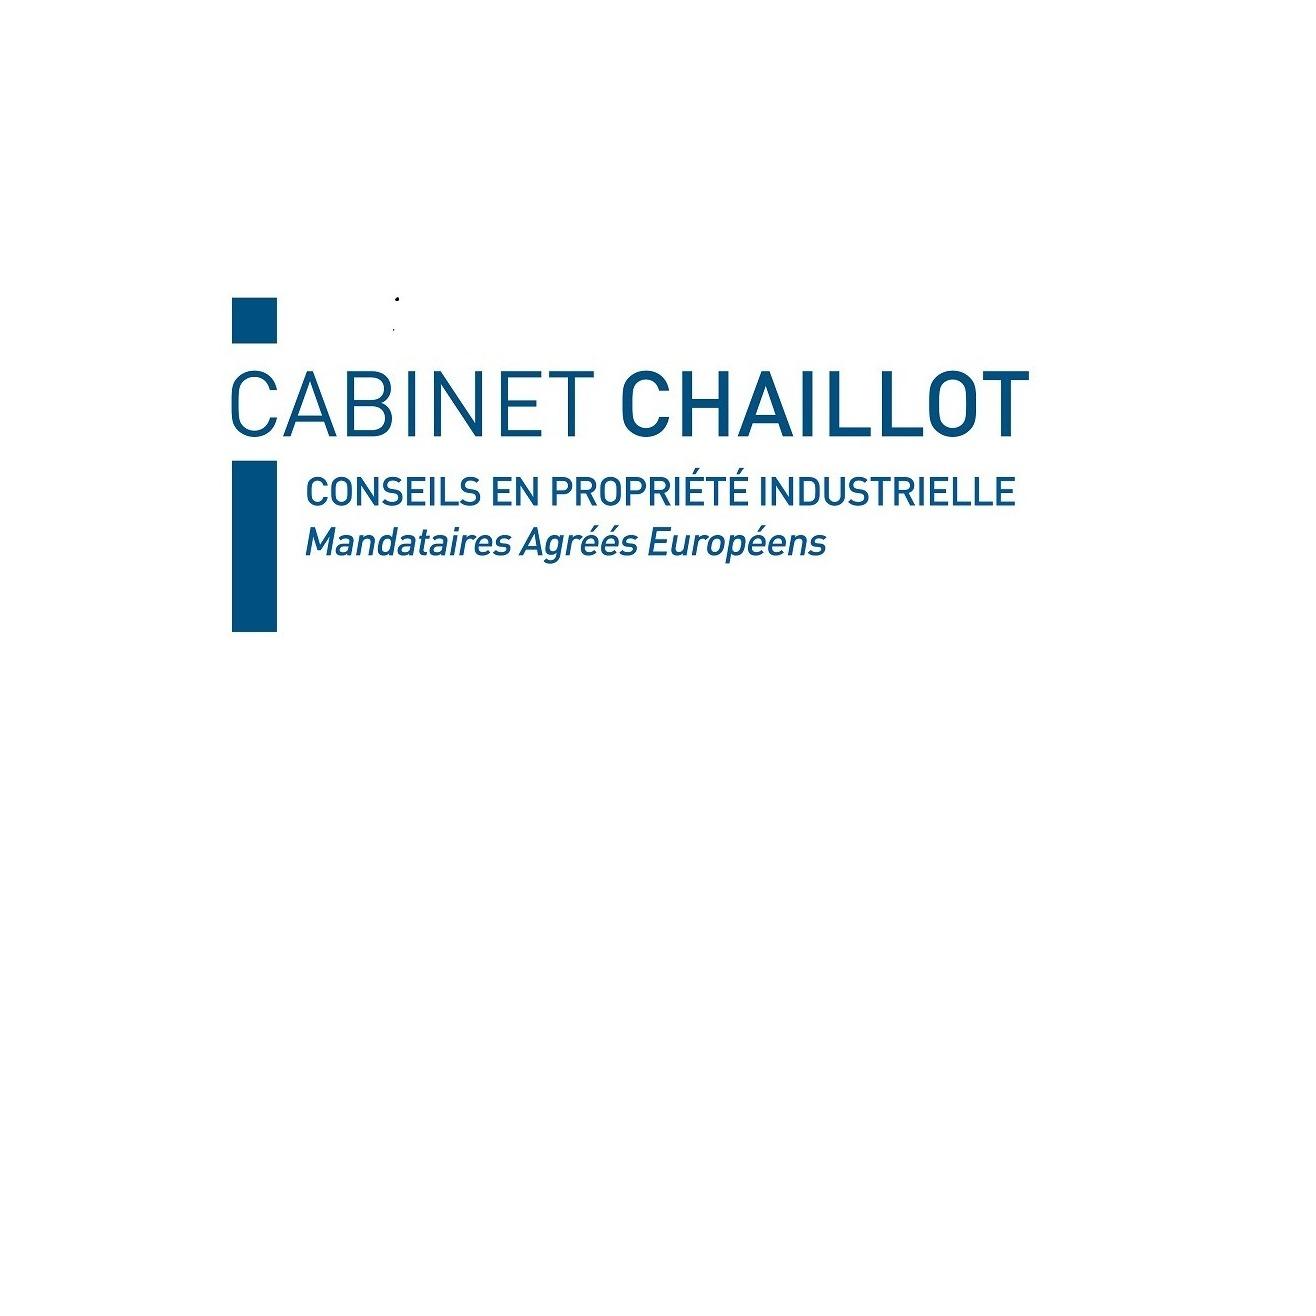 the Chaillot logo.